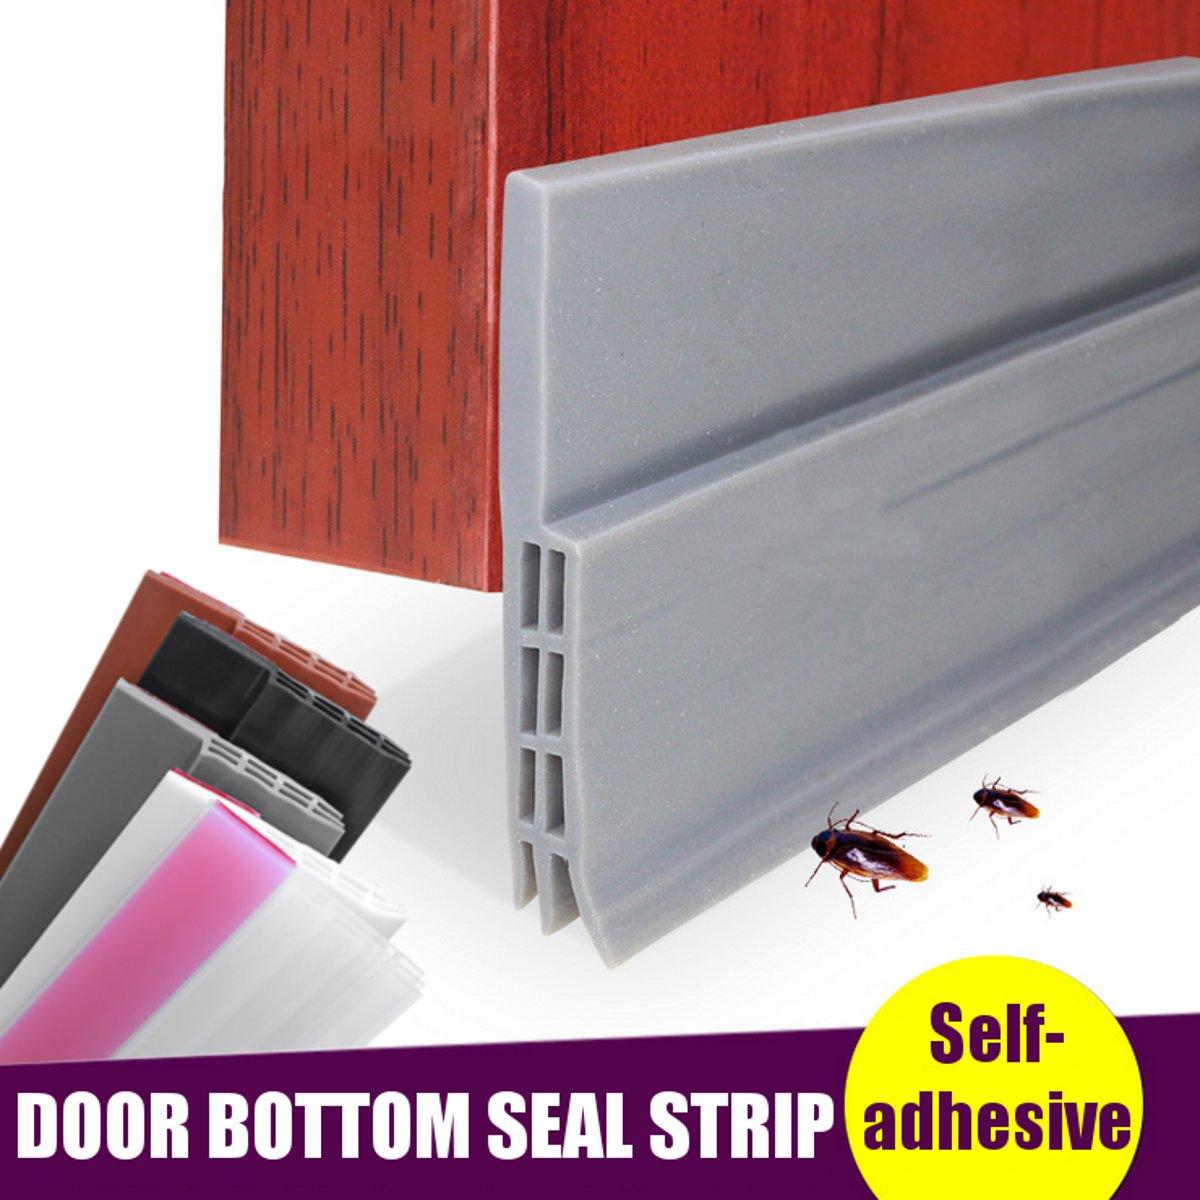 Rubber Self-adhesive Door Bottom Sealing Strip Bedroom Soundproof Windproof Sealer Guard Stopper Furniture Accessories 5 Colors